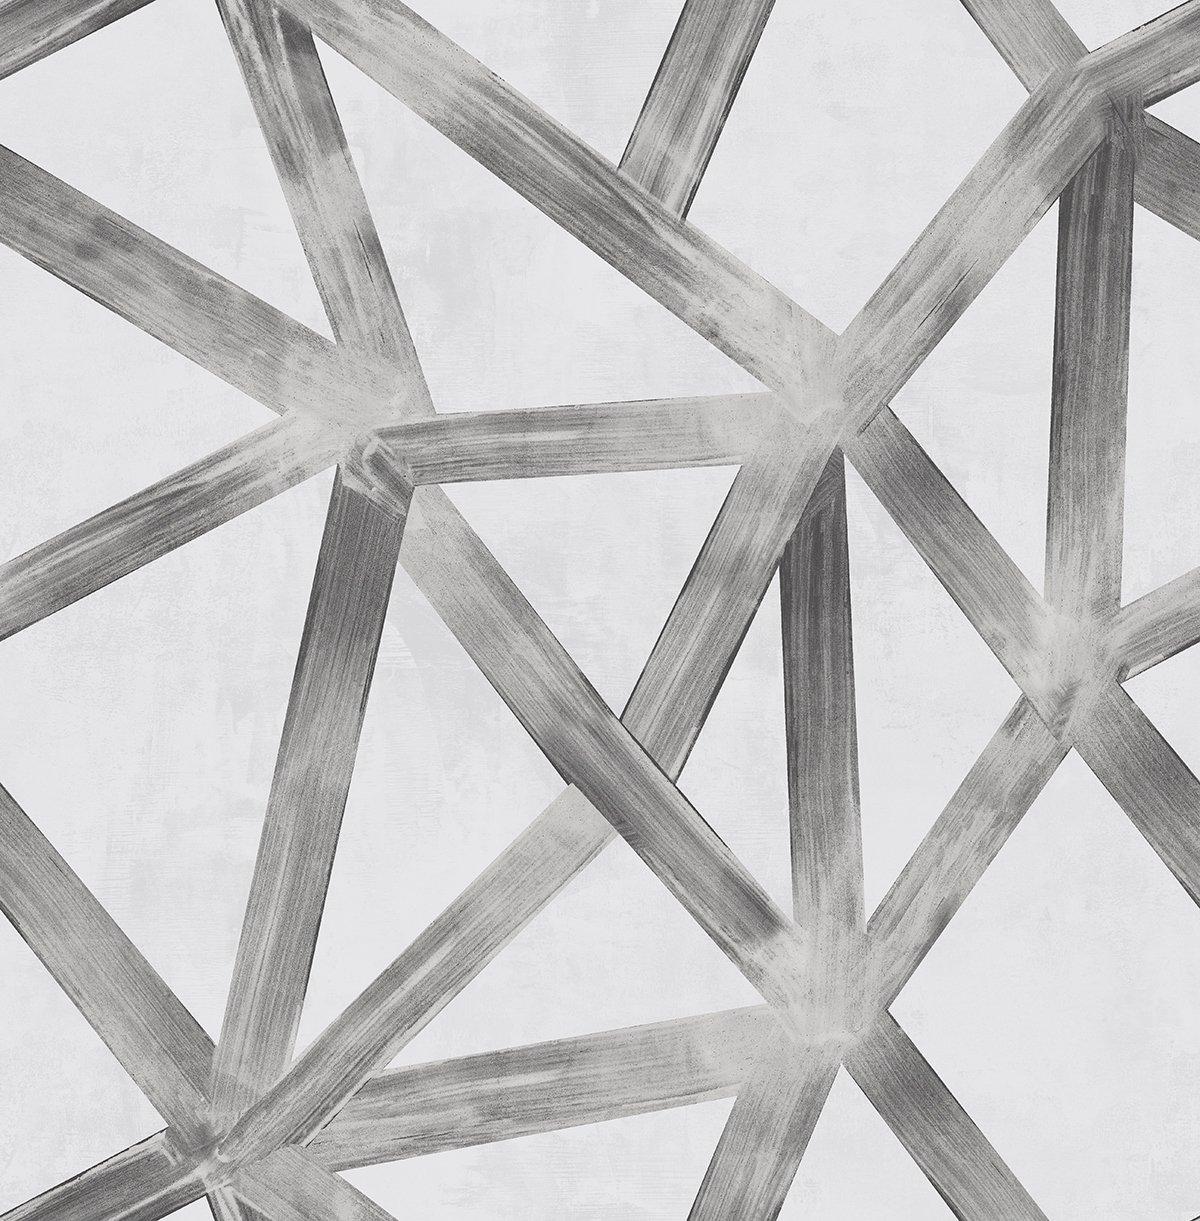 Zebra Wallpaper Interstellar (Graphite) White Black Gray Silver Cool Abstract Modern Contemporary Graphics